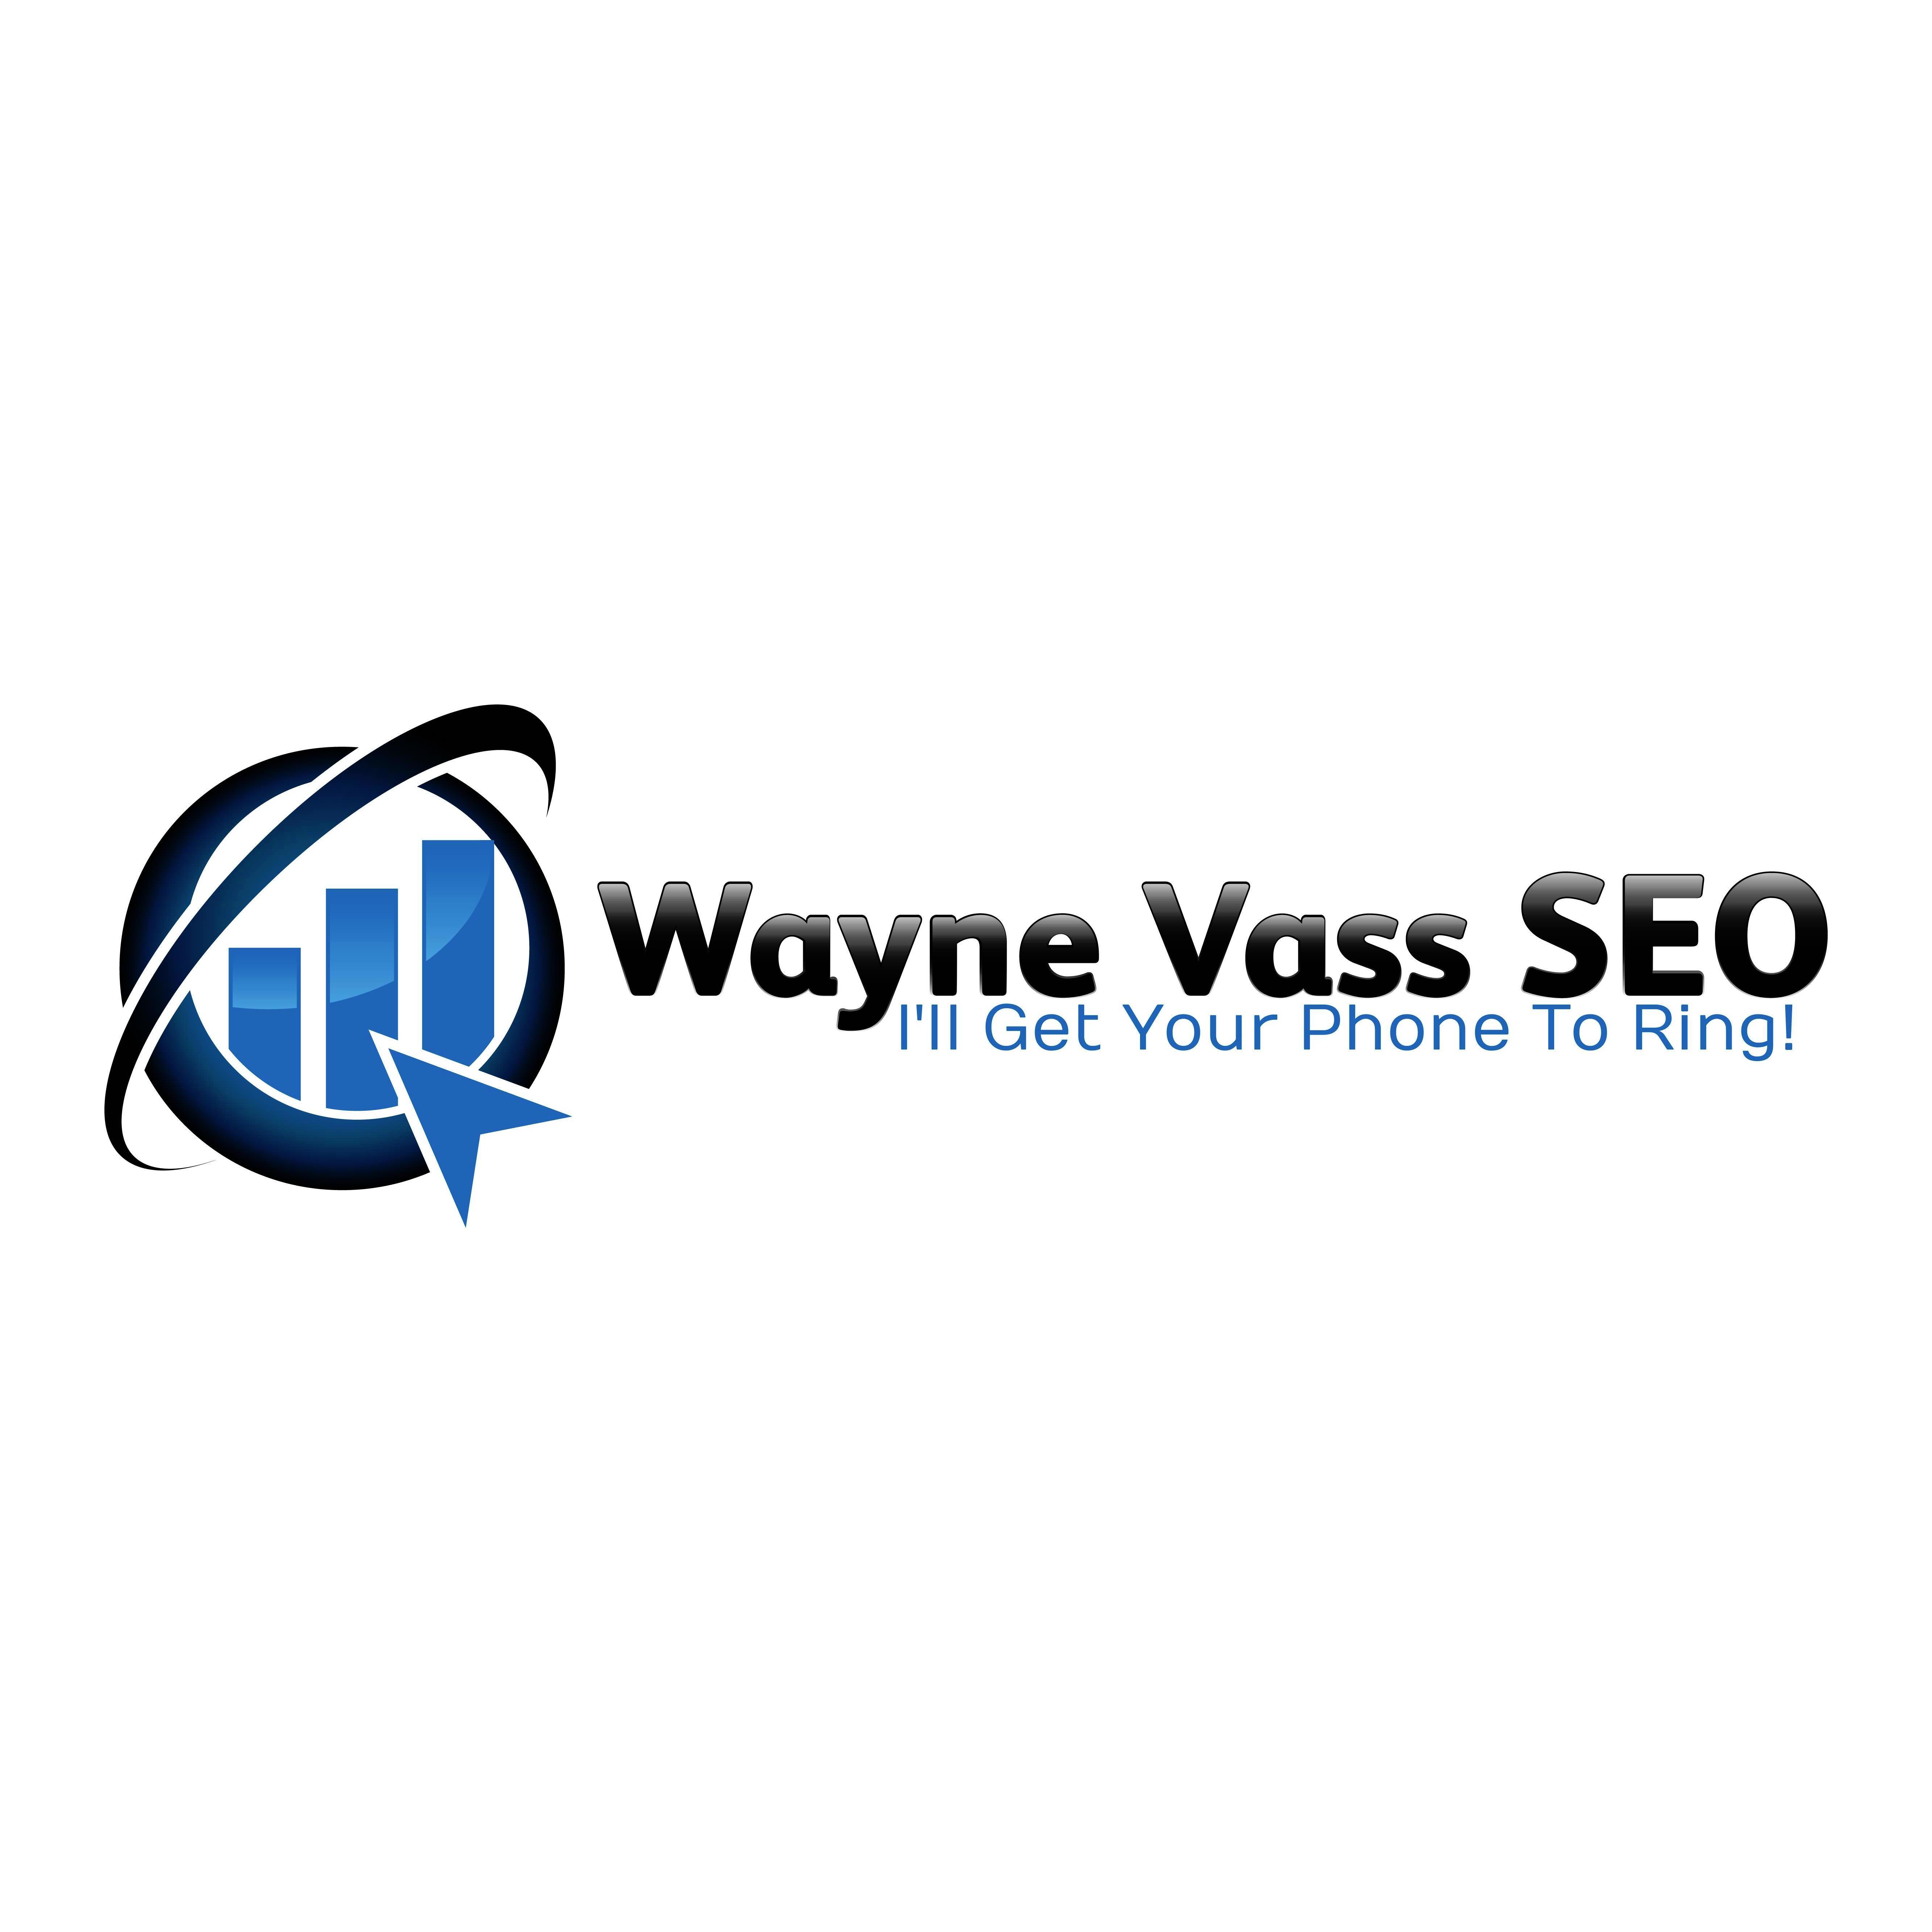 Wayne Vass SEO